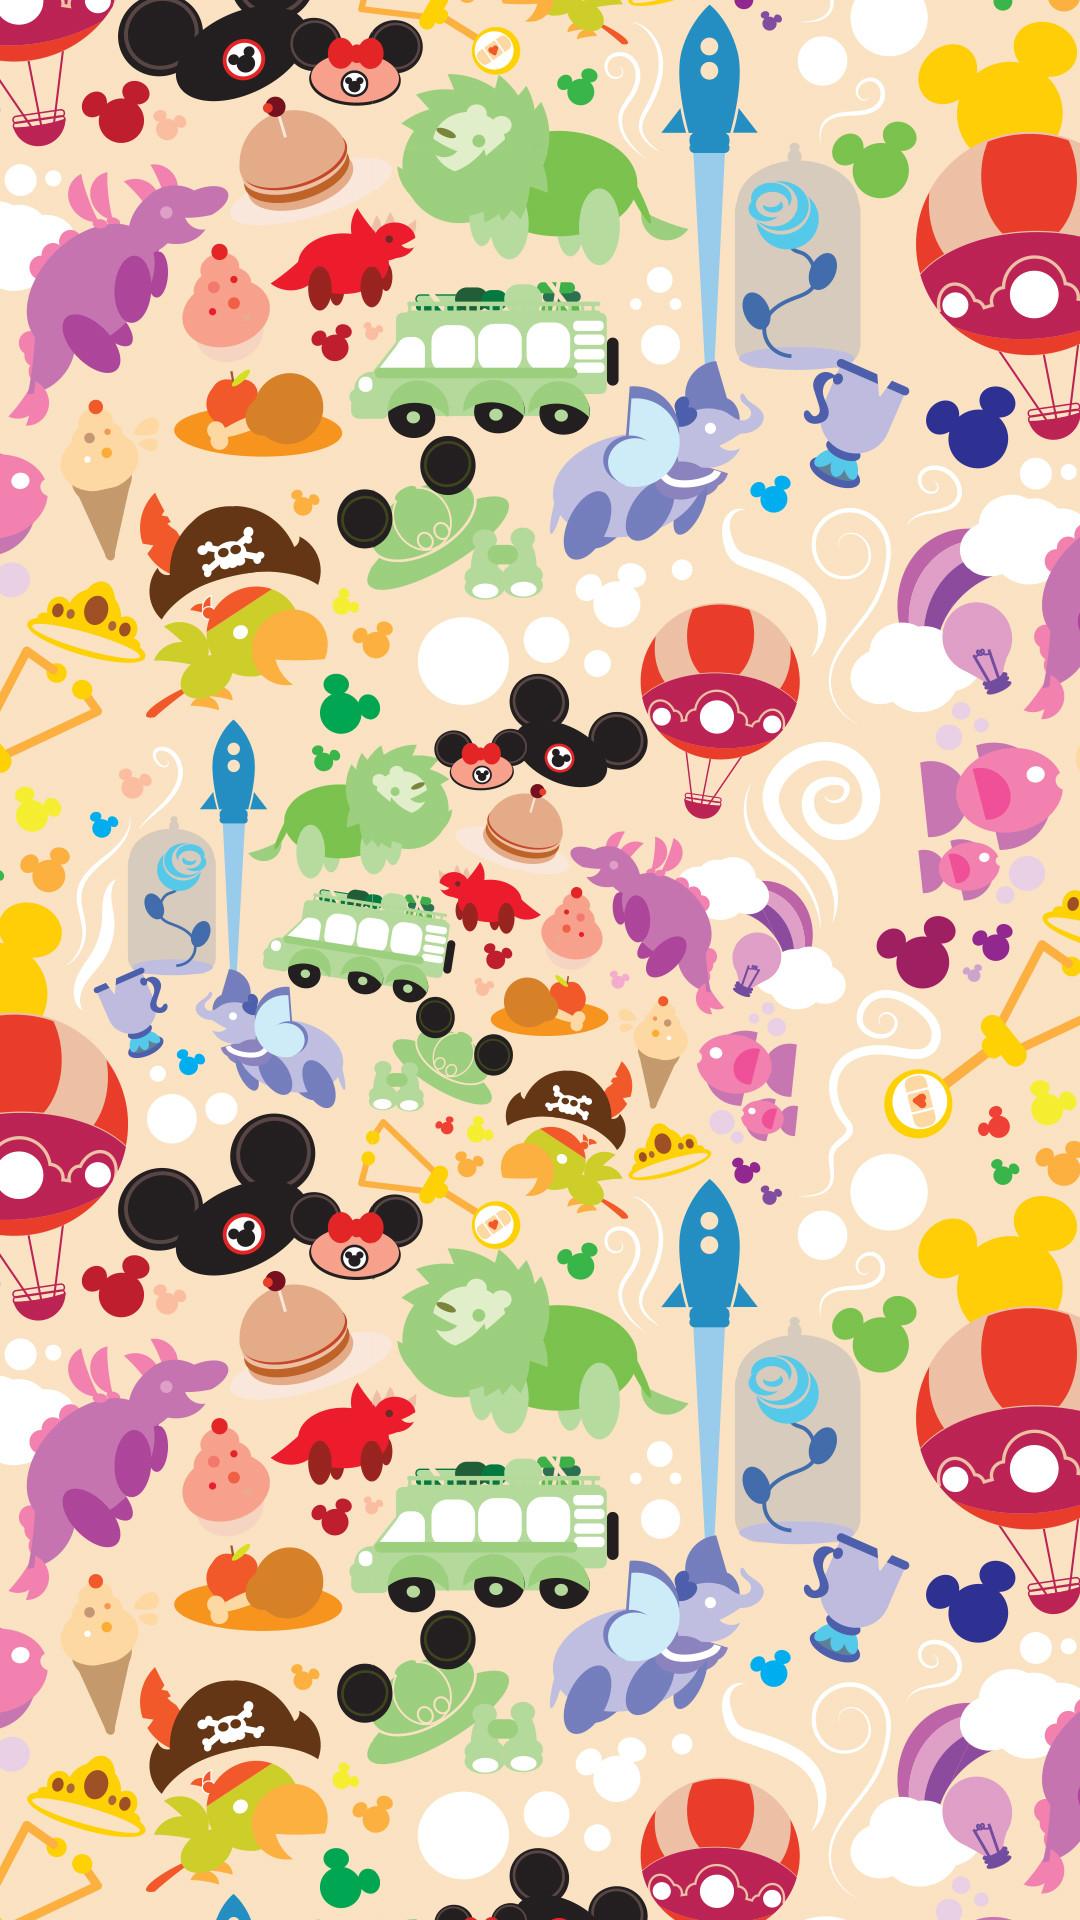 disney wallpaper – Google 검색